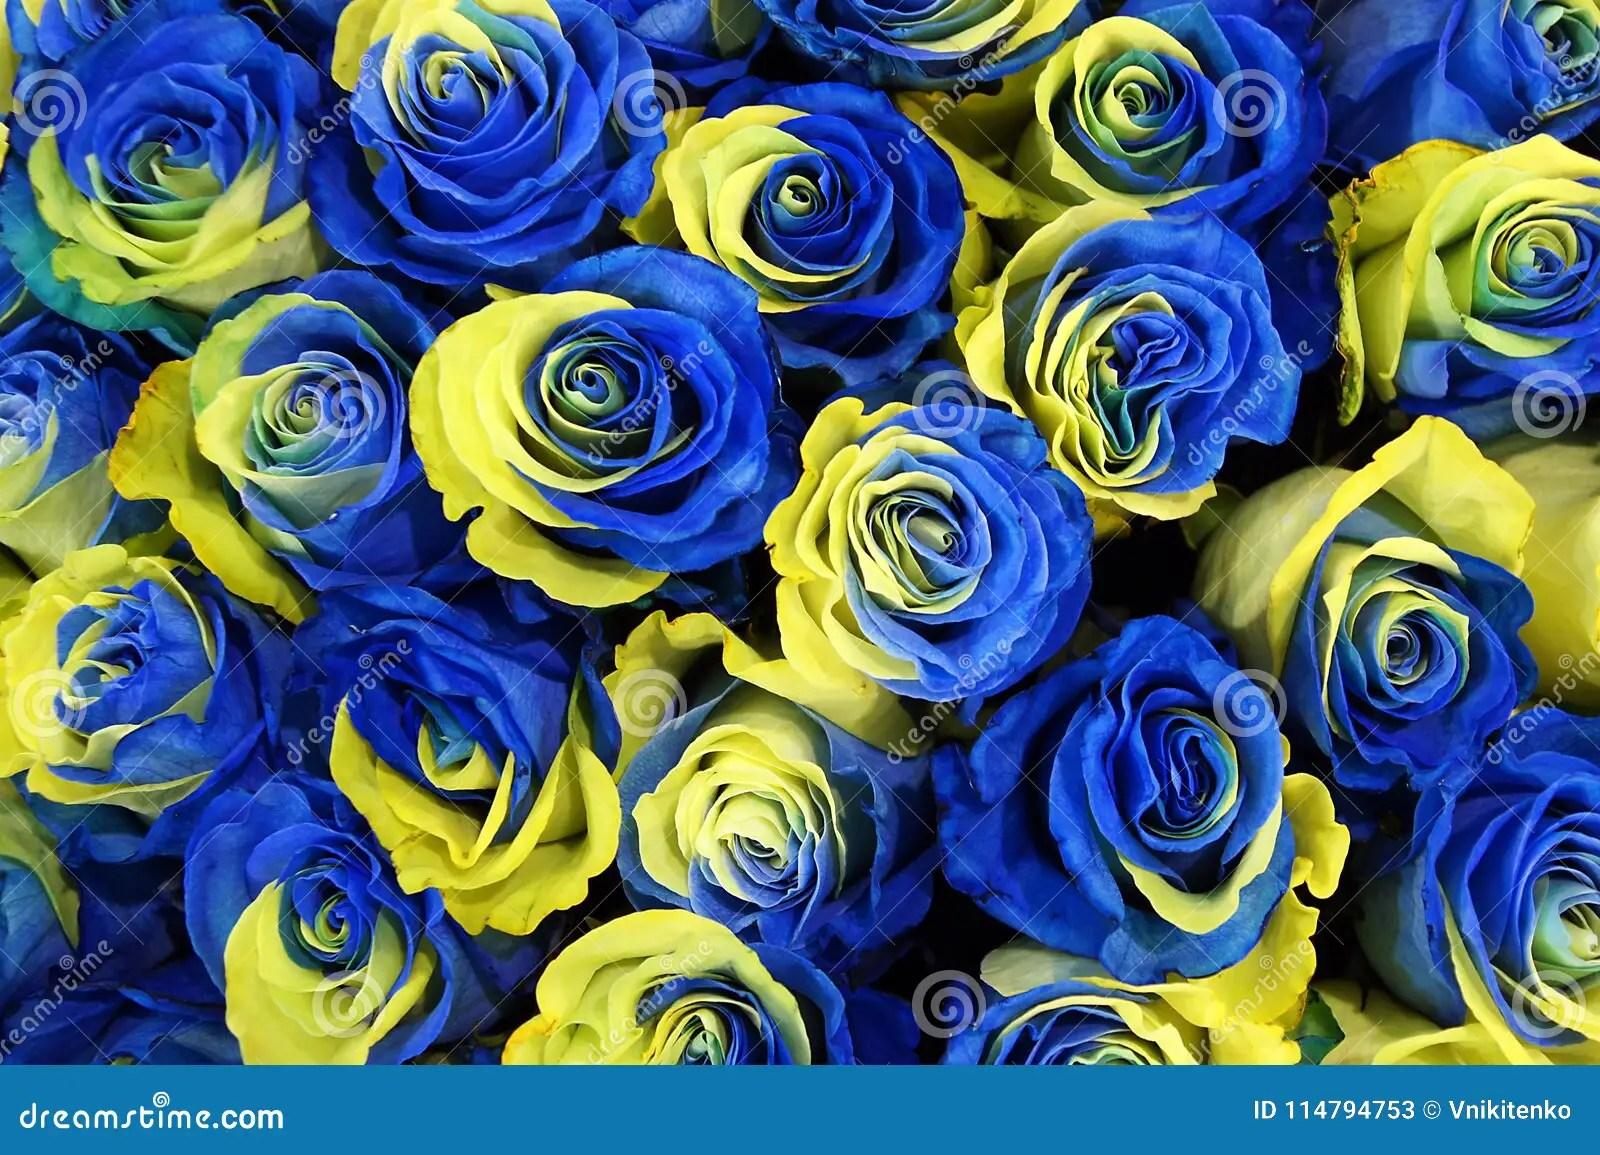 ukraine rose flowers stock